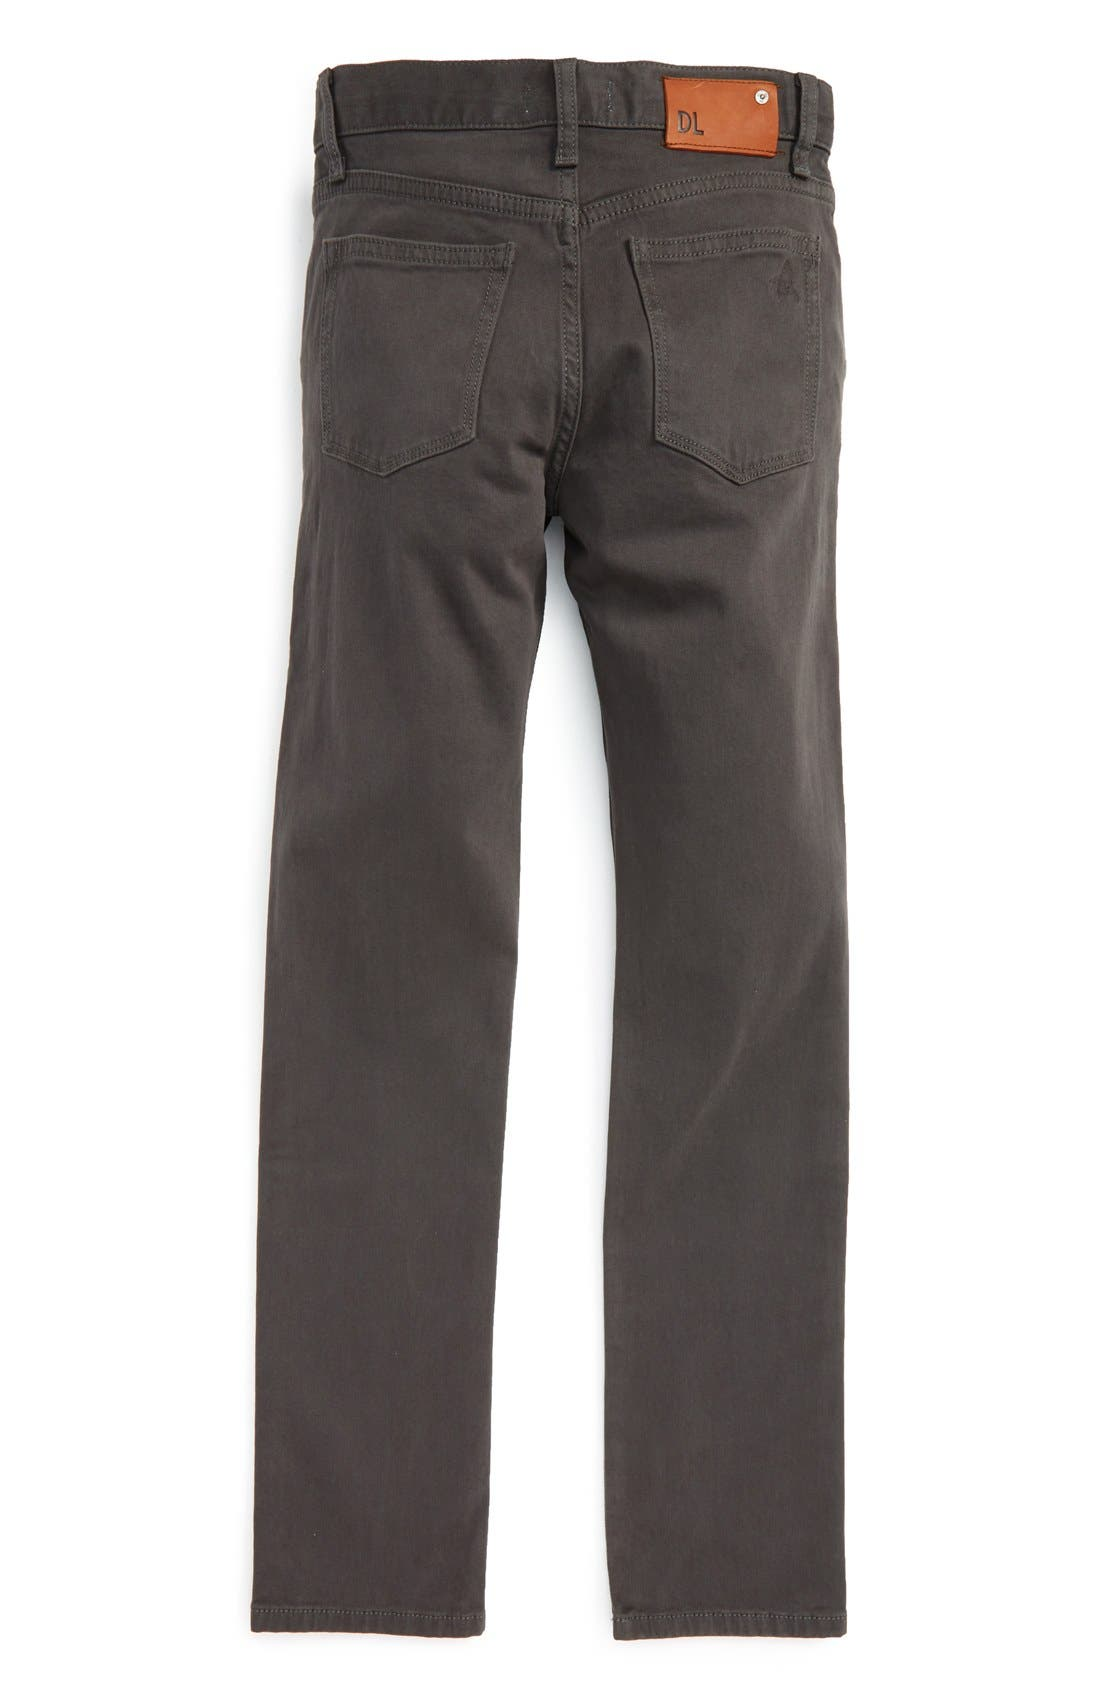 Alternate Image 2  - DL1961 'Hawke' Skinny Jeans (Big Boys)